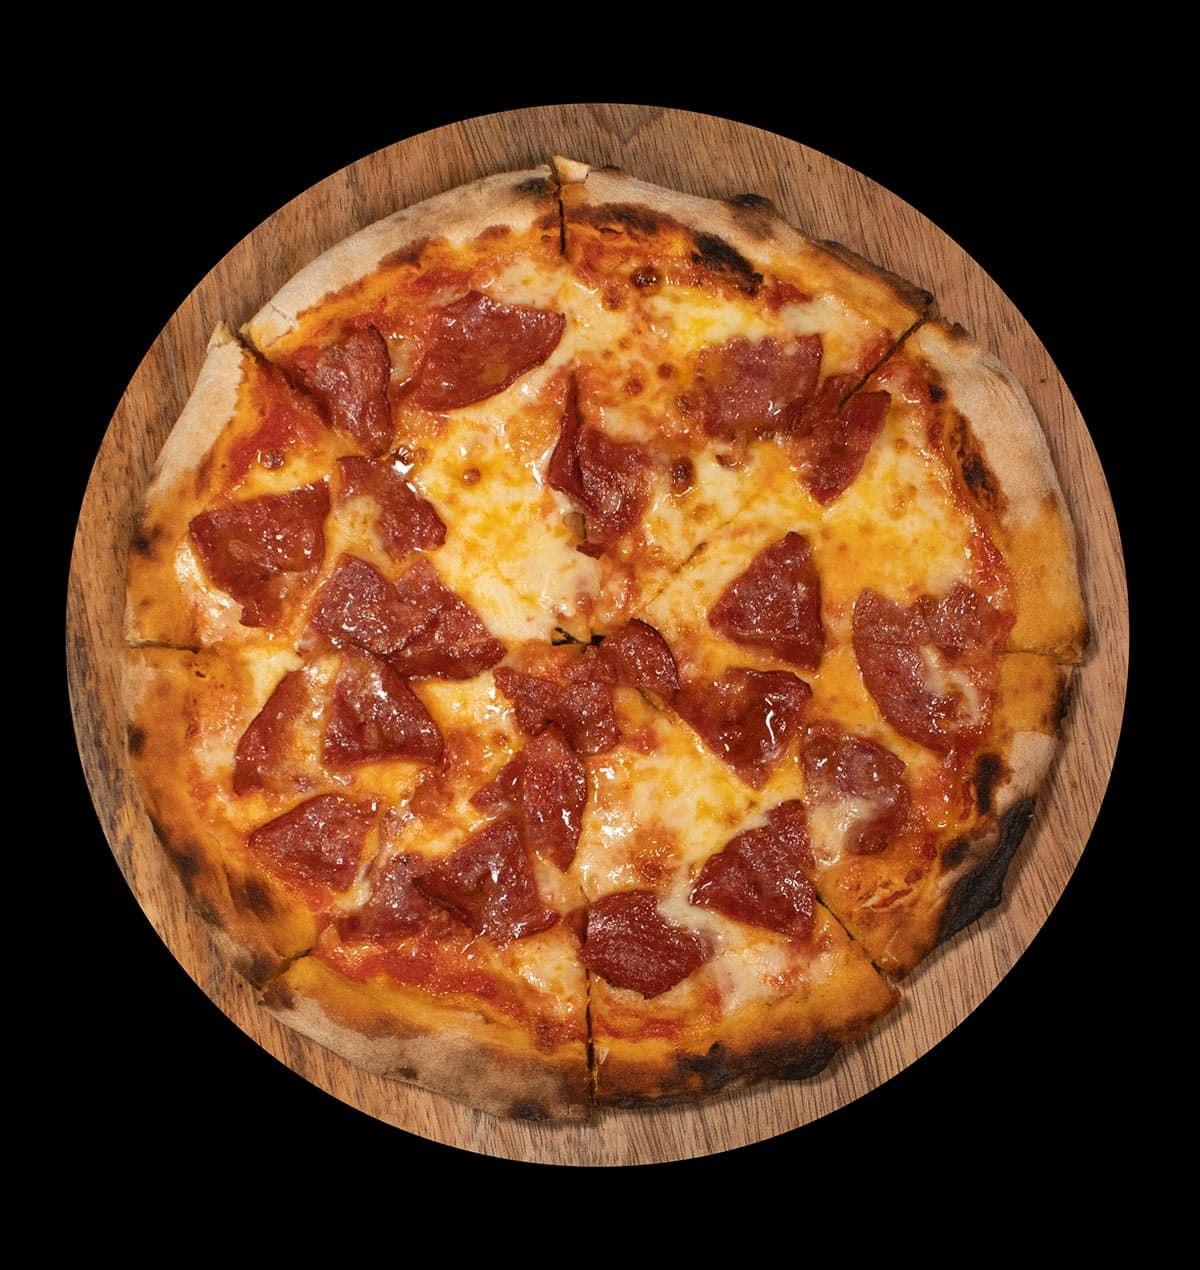 Kaya Pepperoni pizza